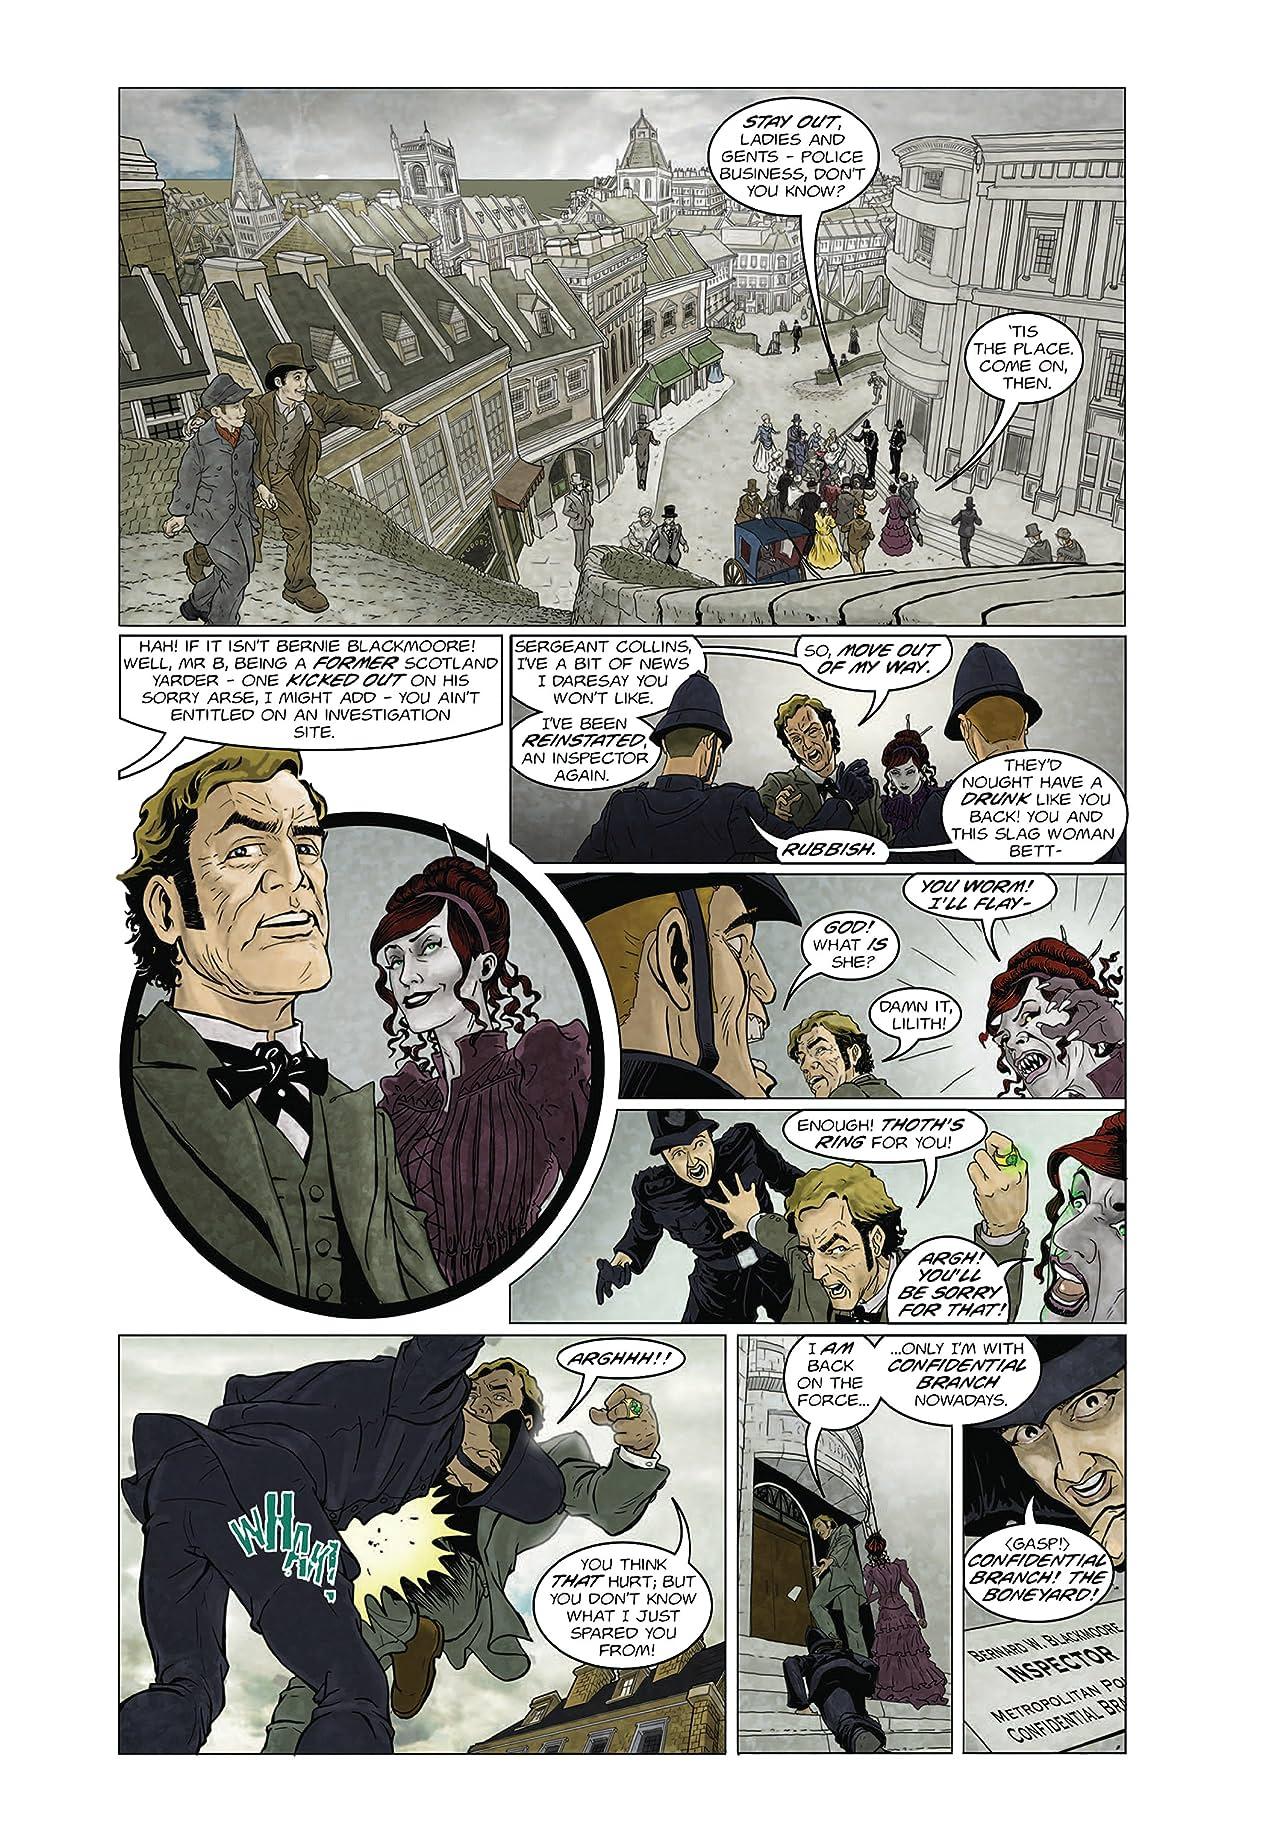 Sherlock Holmes Dark Detective #4